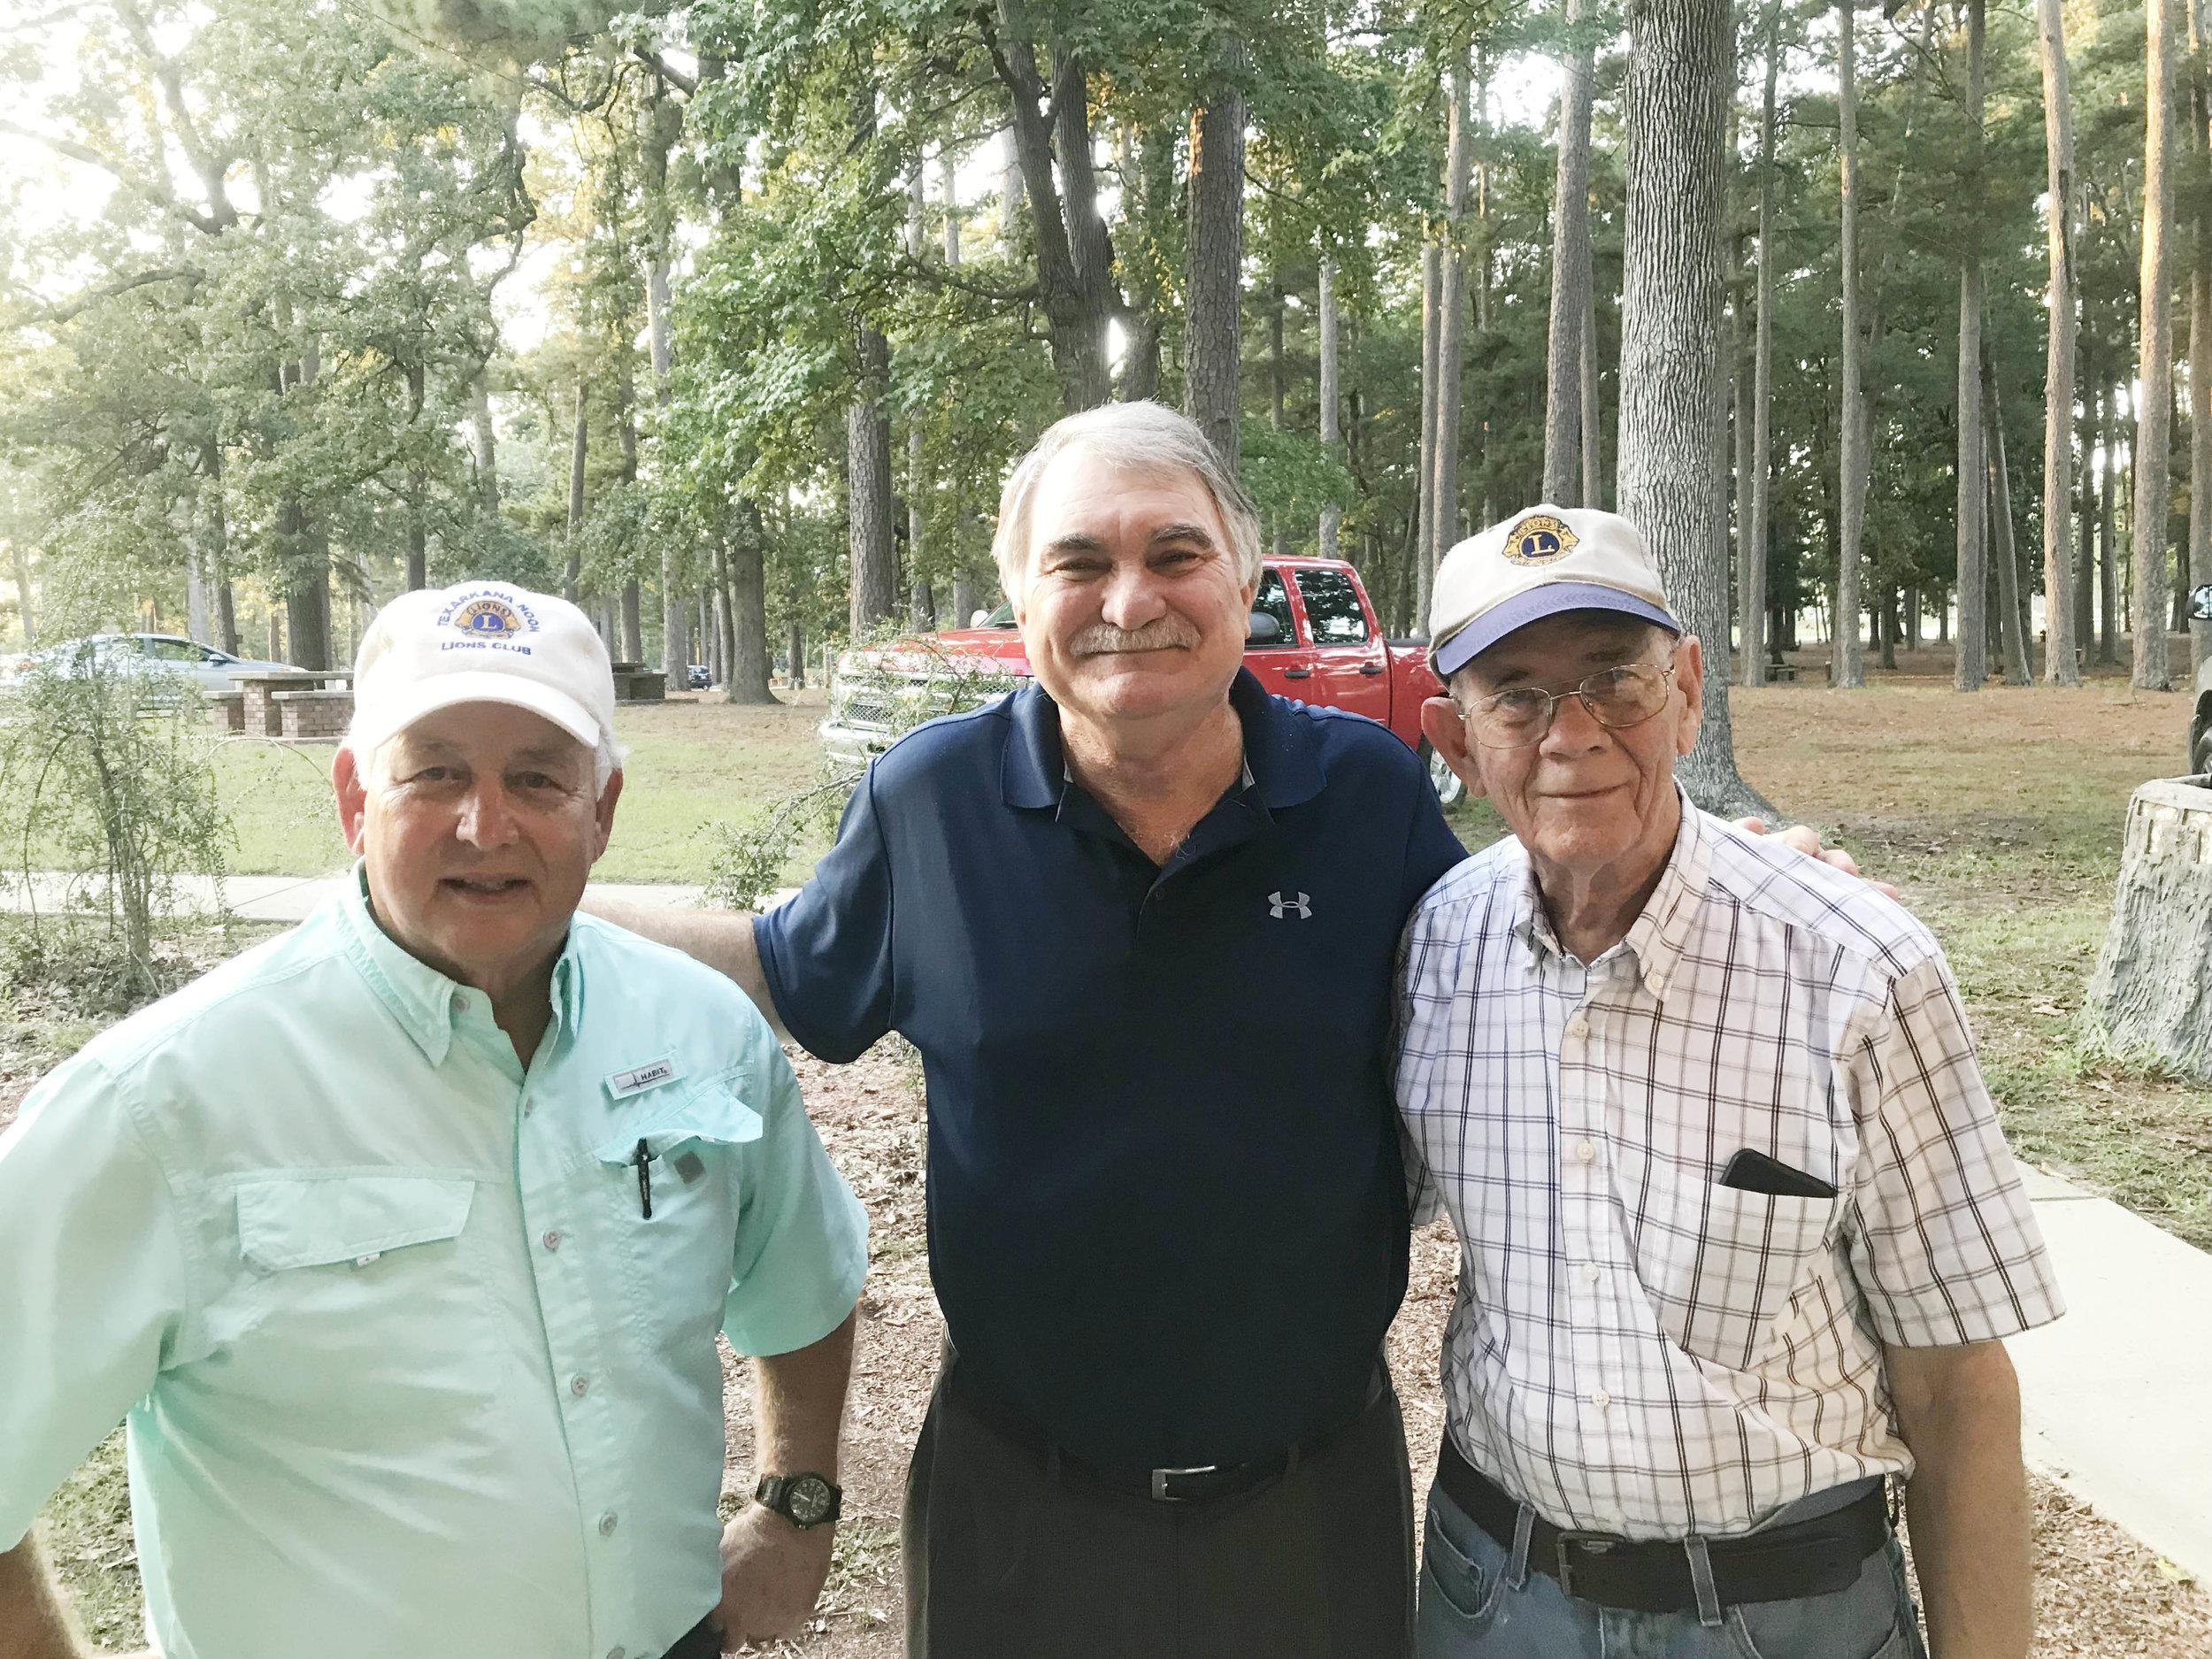 John Norton, George Carpenter and Ed Foster